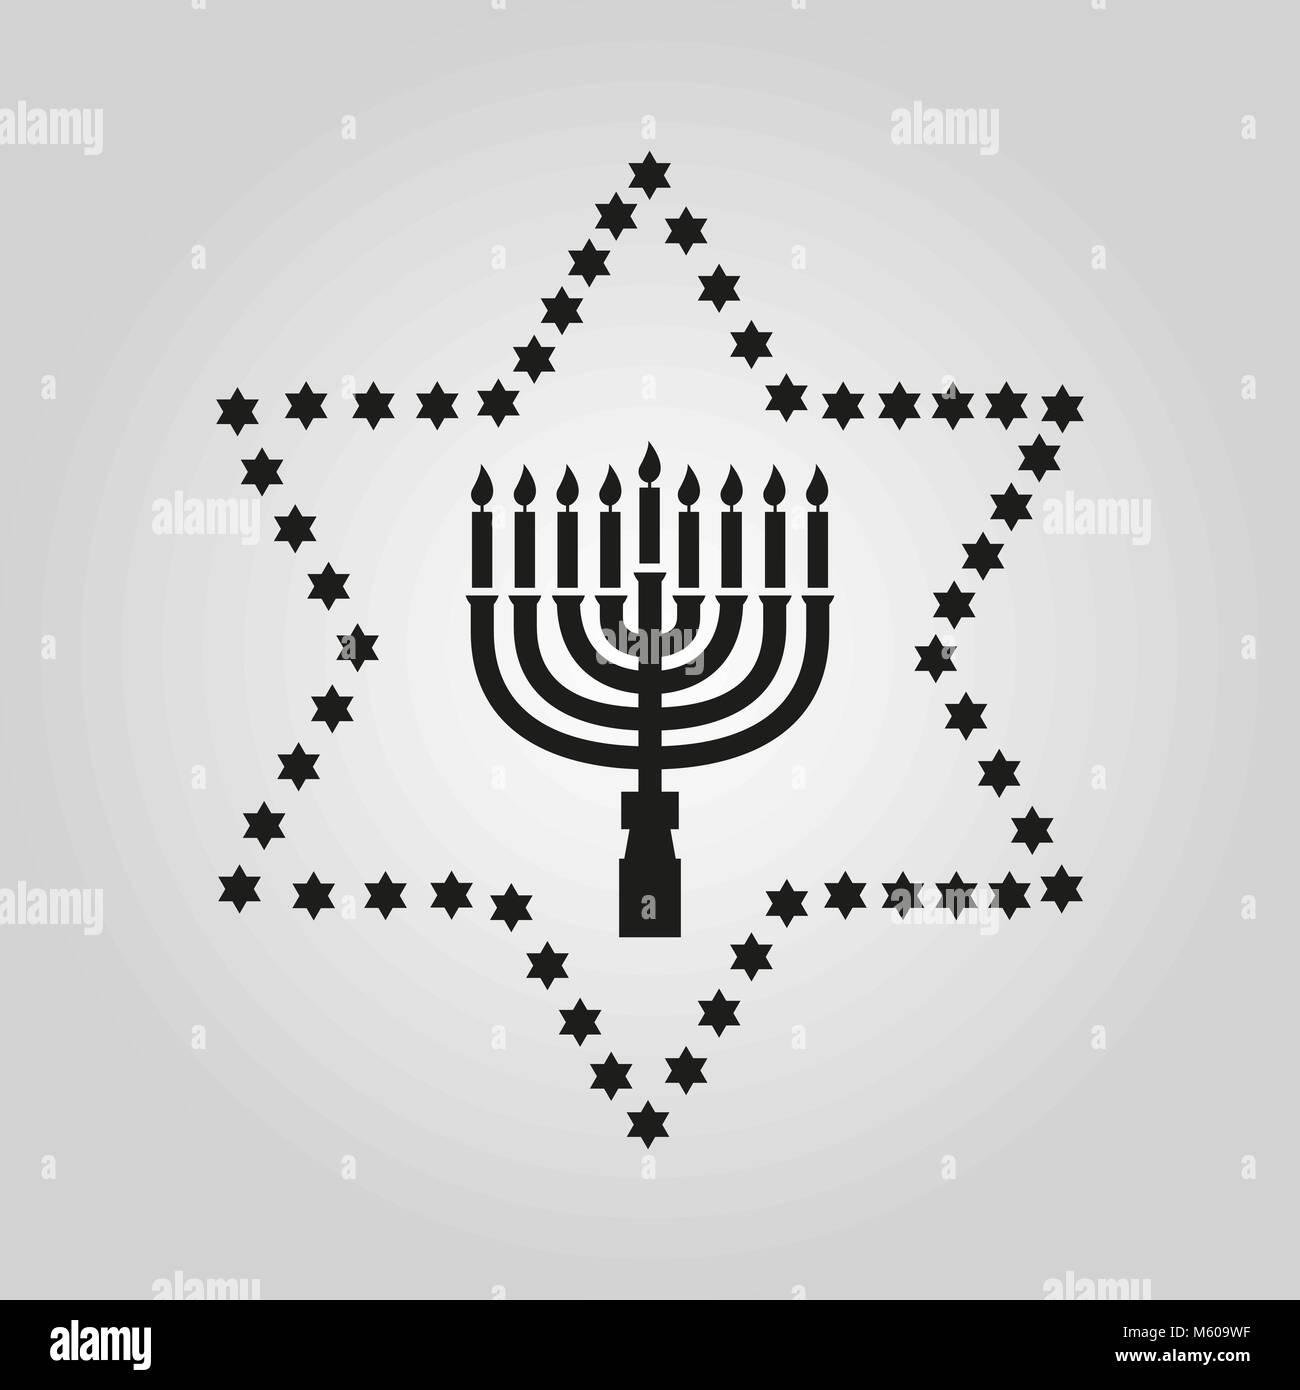 Happy Hanukkah Black And White Stock Photos Images Alamy